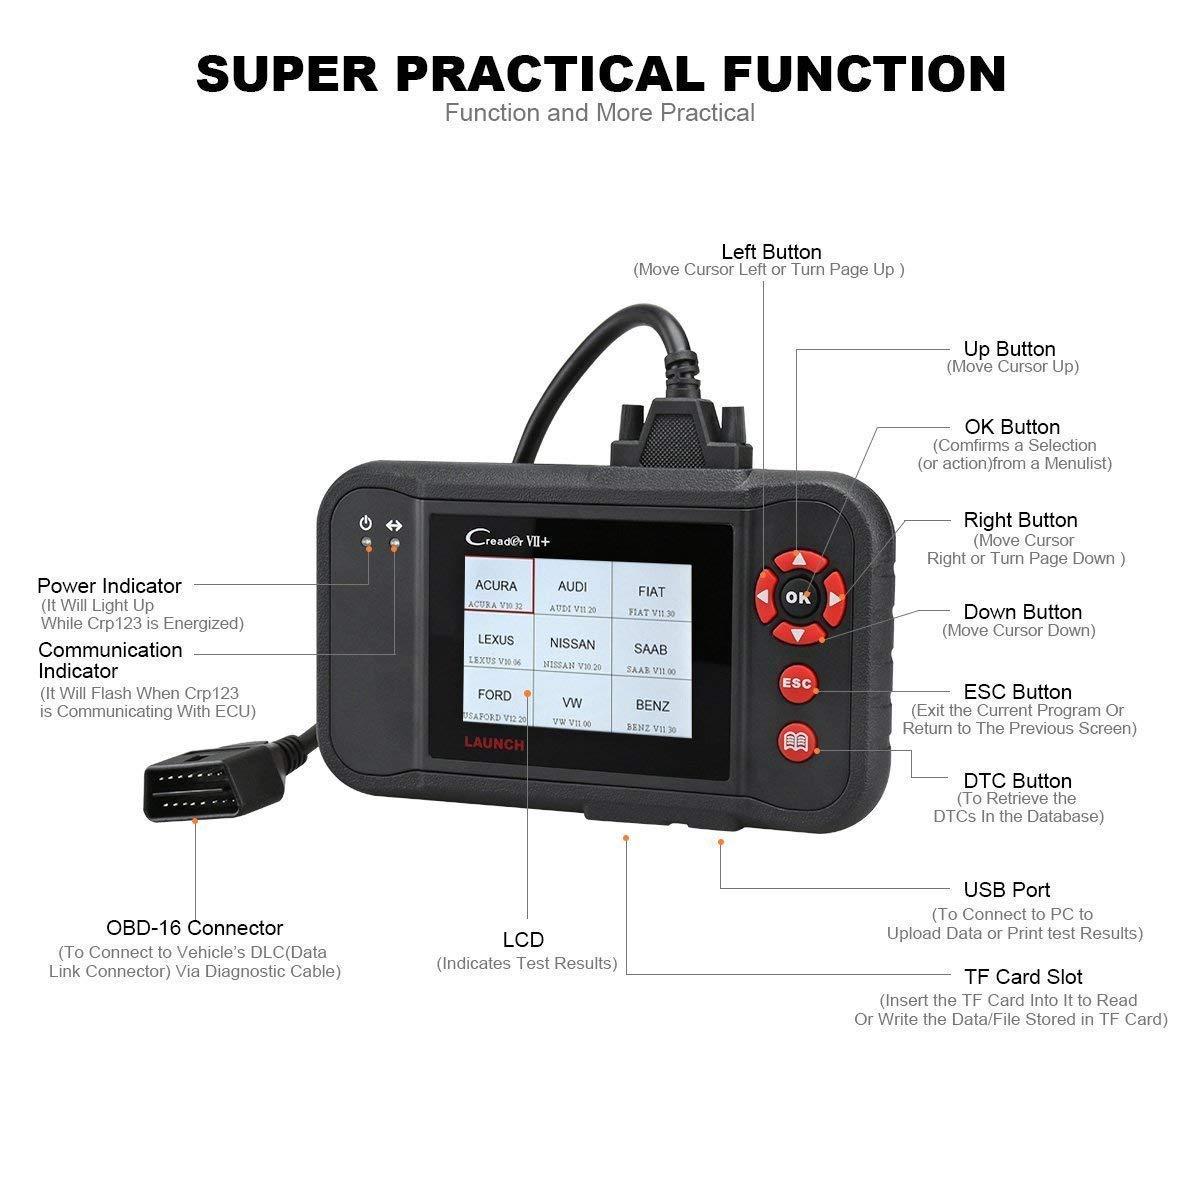 Launch Creader Vii Obd2 Scanner Abs Srs Transmission 2000 F250 Wiring Diagram And Engine Code Reader Diagnostic Scan Tool Automotive